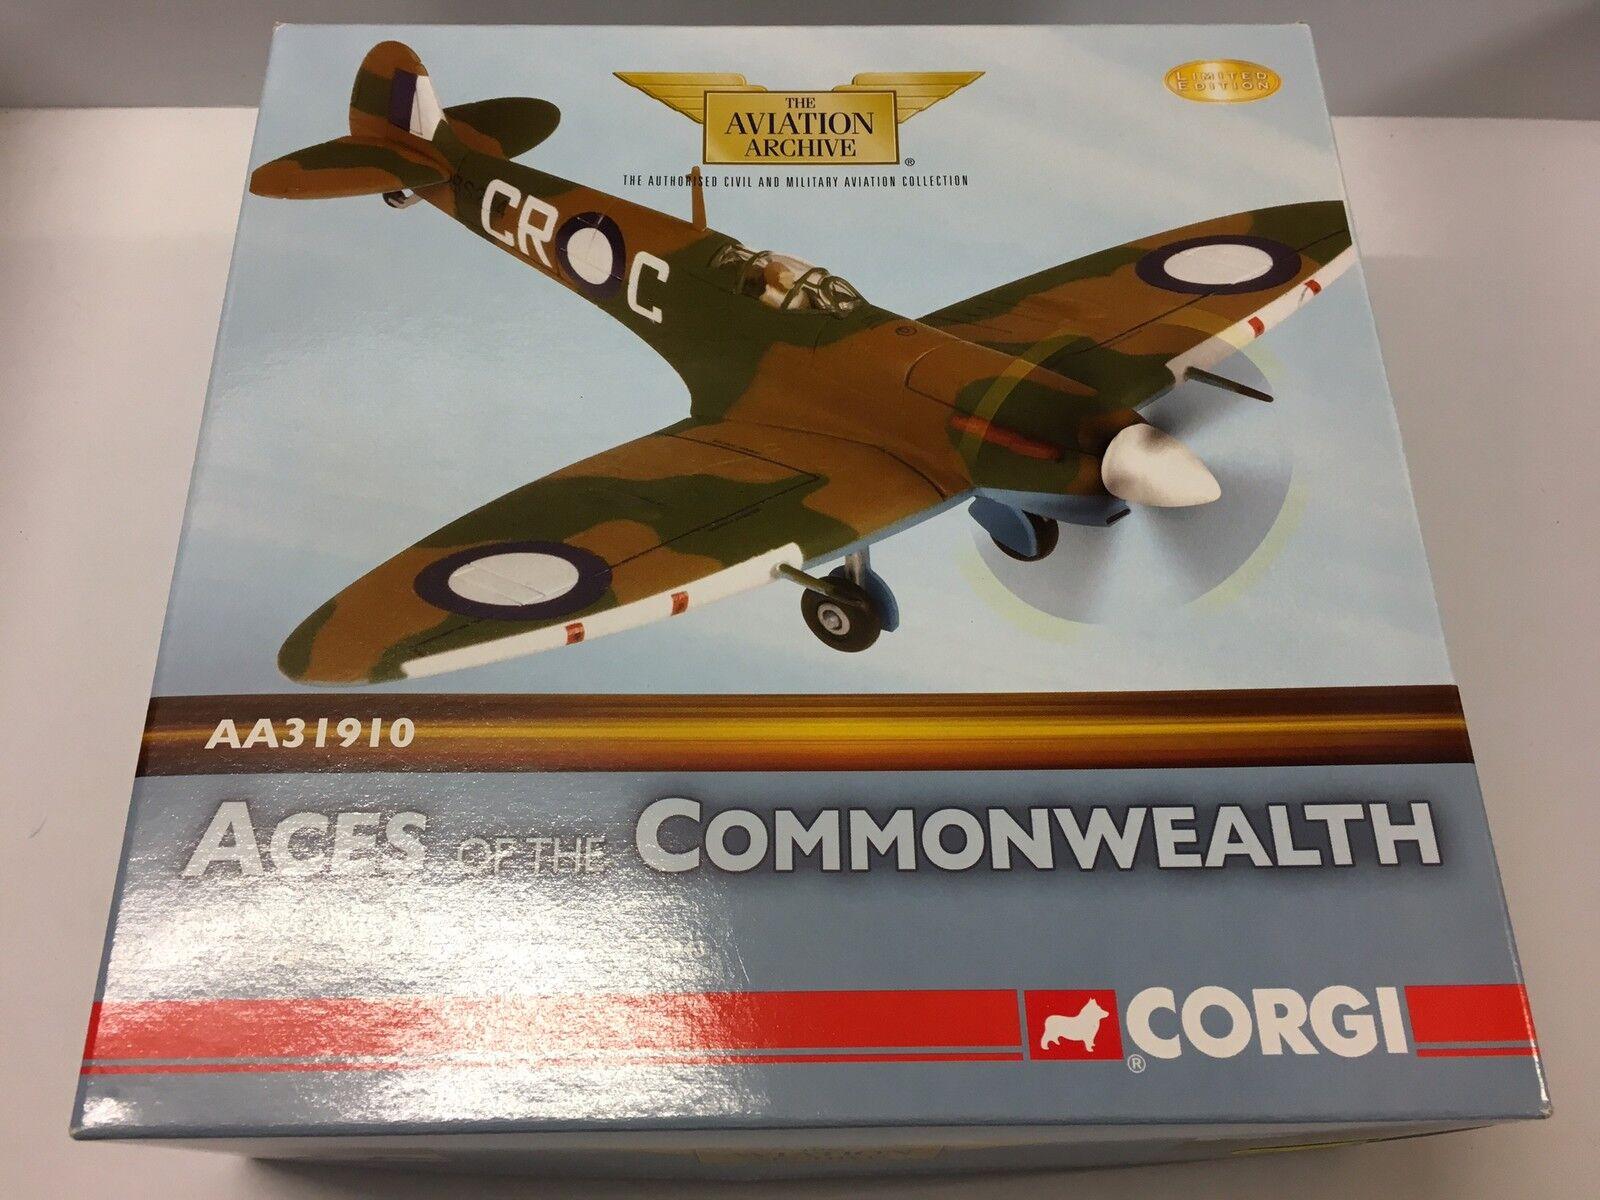 Corgi AA31910 Supermarine Spitfire Mk VC OC.1 RAF Ltd Edition No. 0002 of 2900